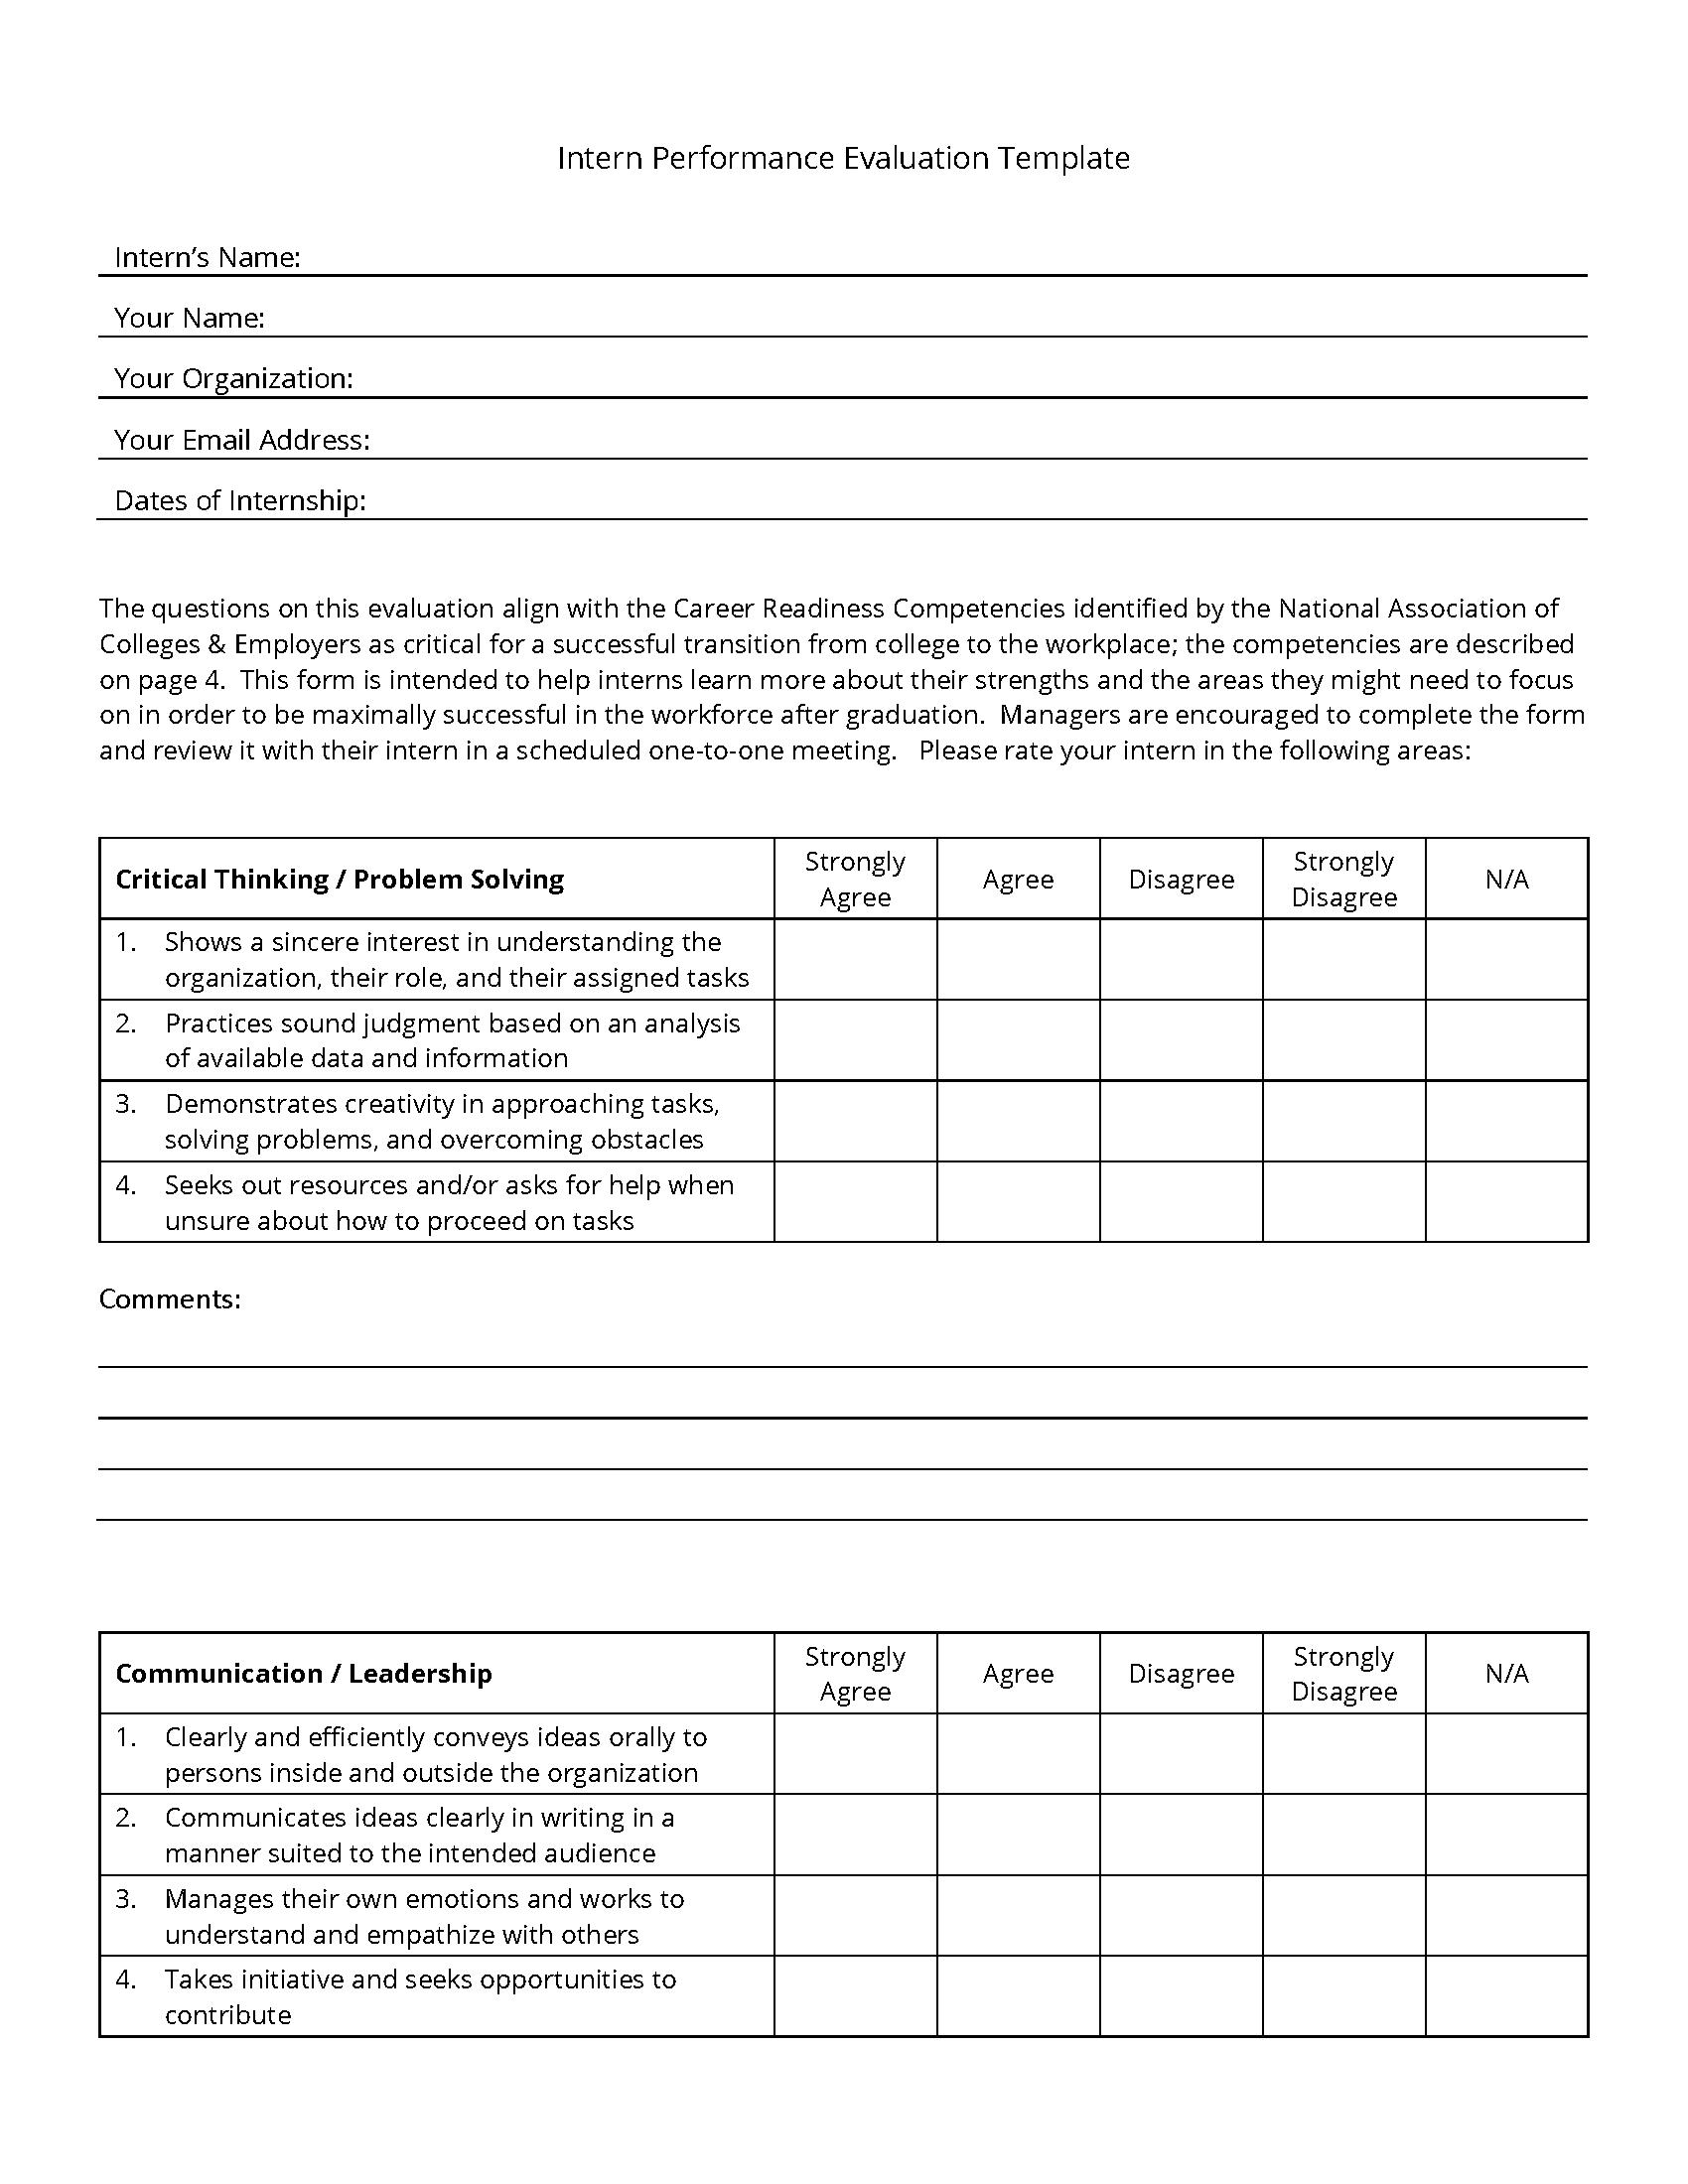 Intern Performance Evaluation Template Career